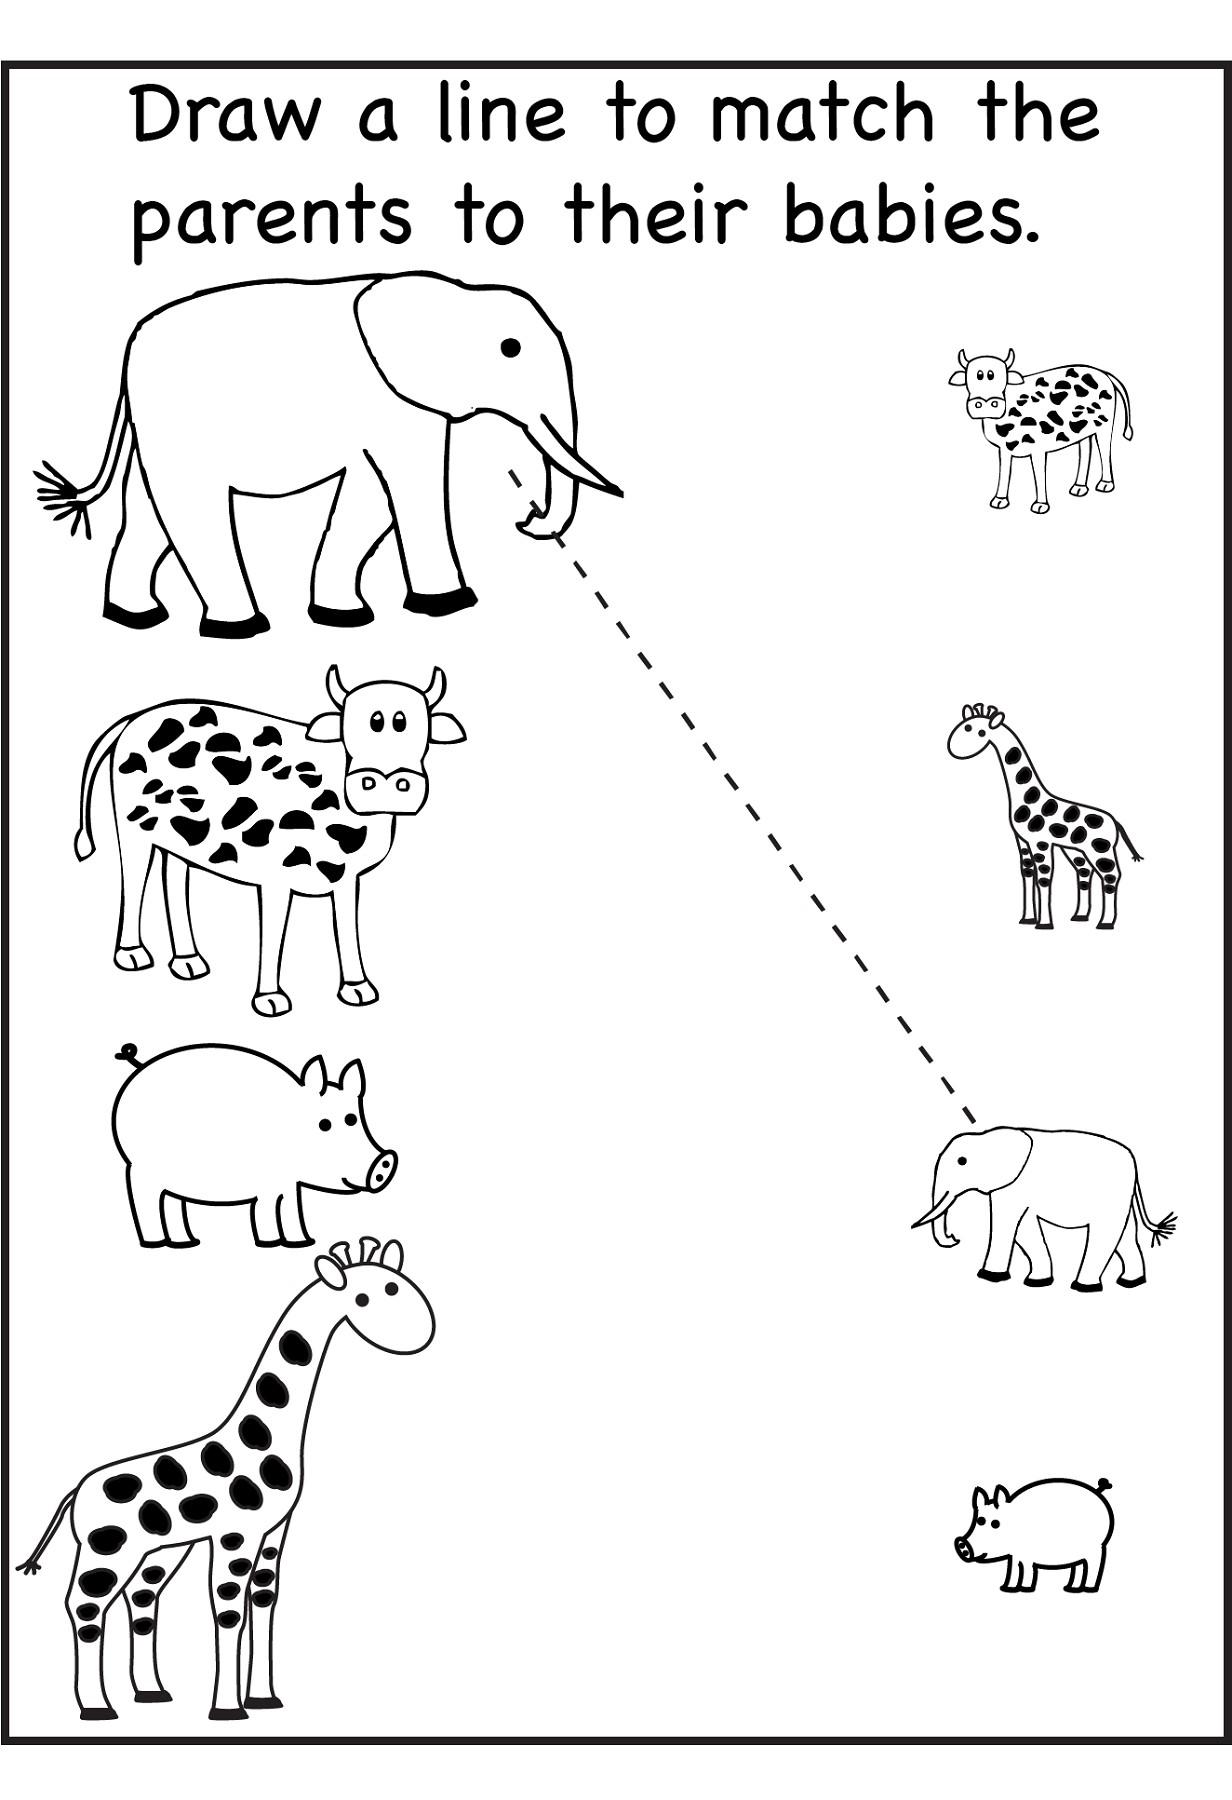 Unlock Activities Sheets For Kids Printable Toddlers Free Inspirationa - Free Printable Activities For Preschoolers